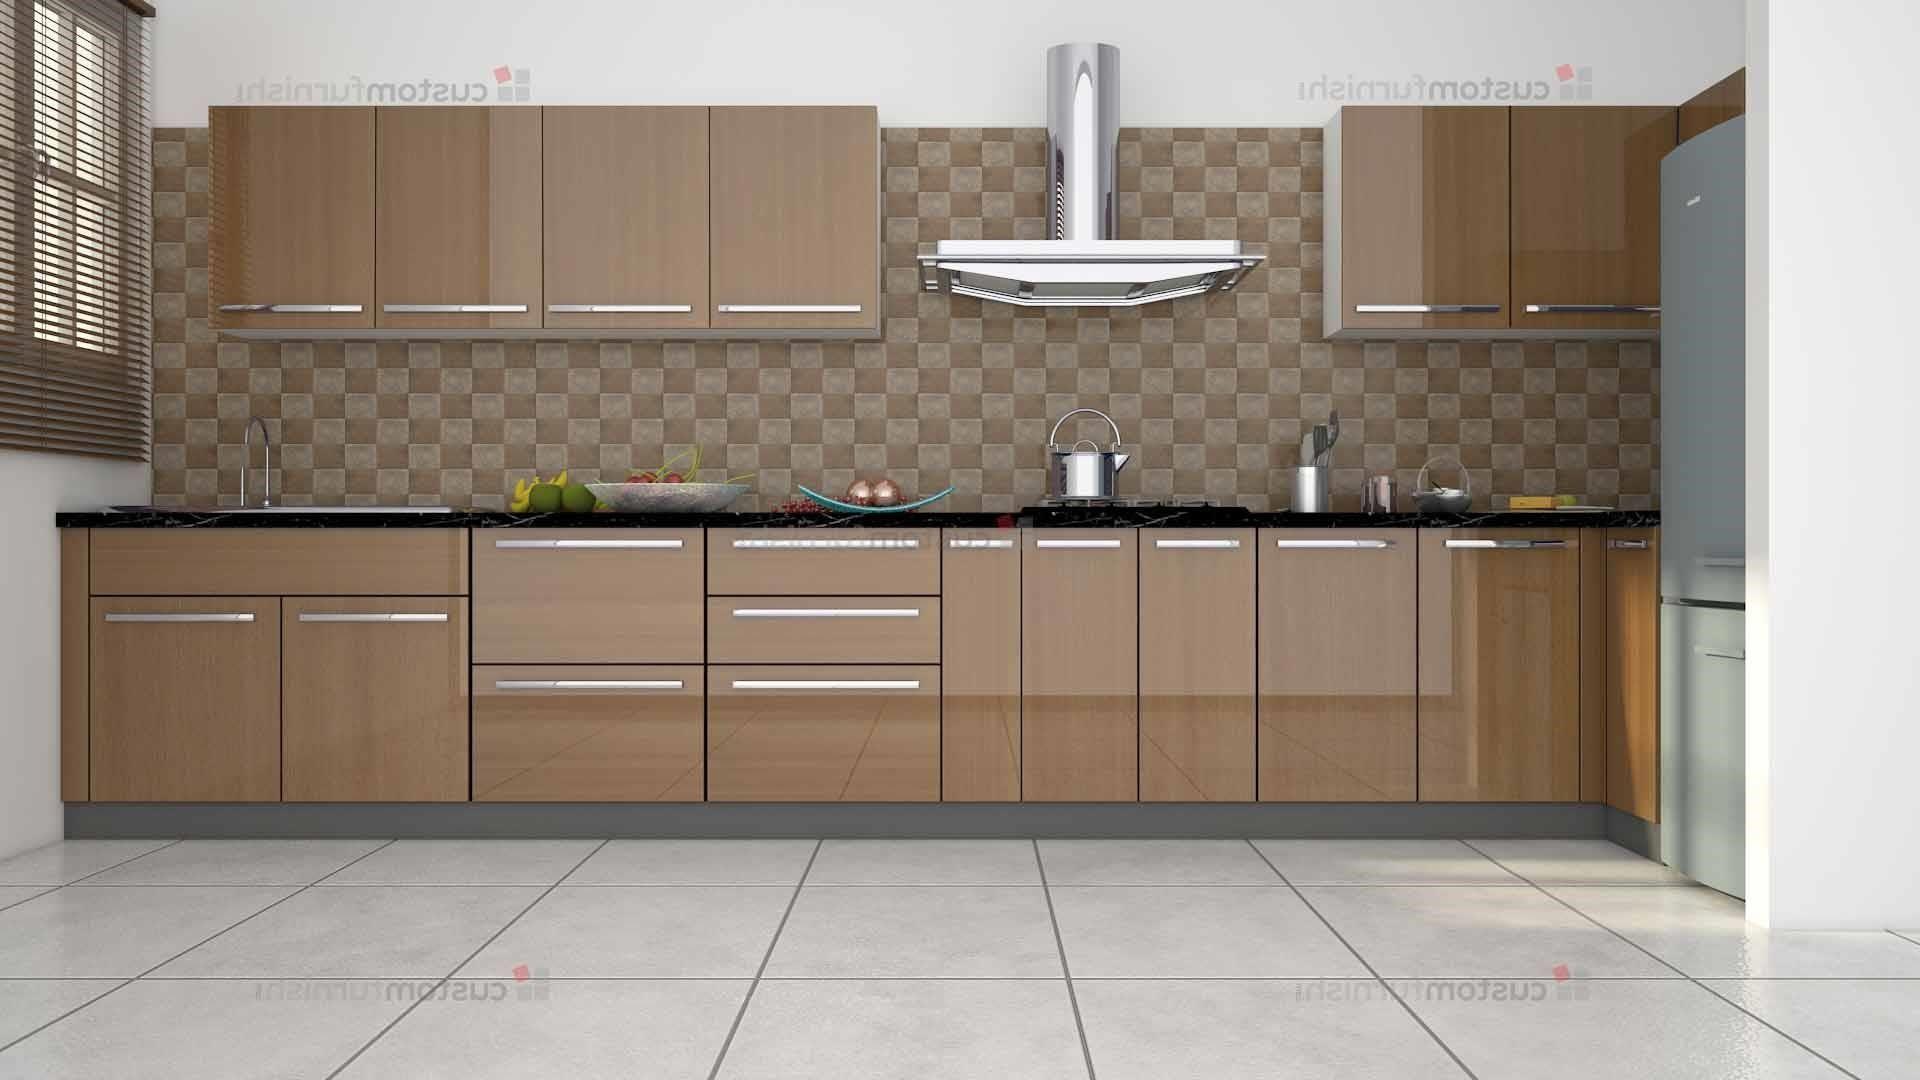 Genial L Shaped Modular Kitchen Designs Catalogue 1,920×1,080